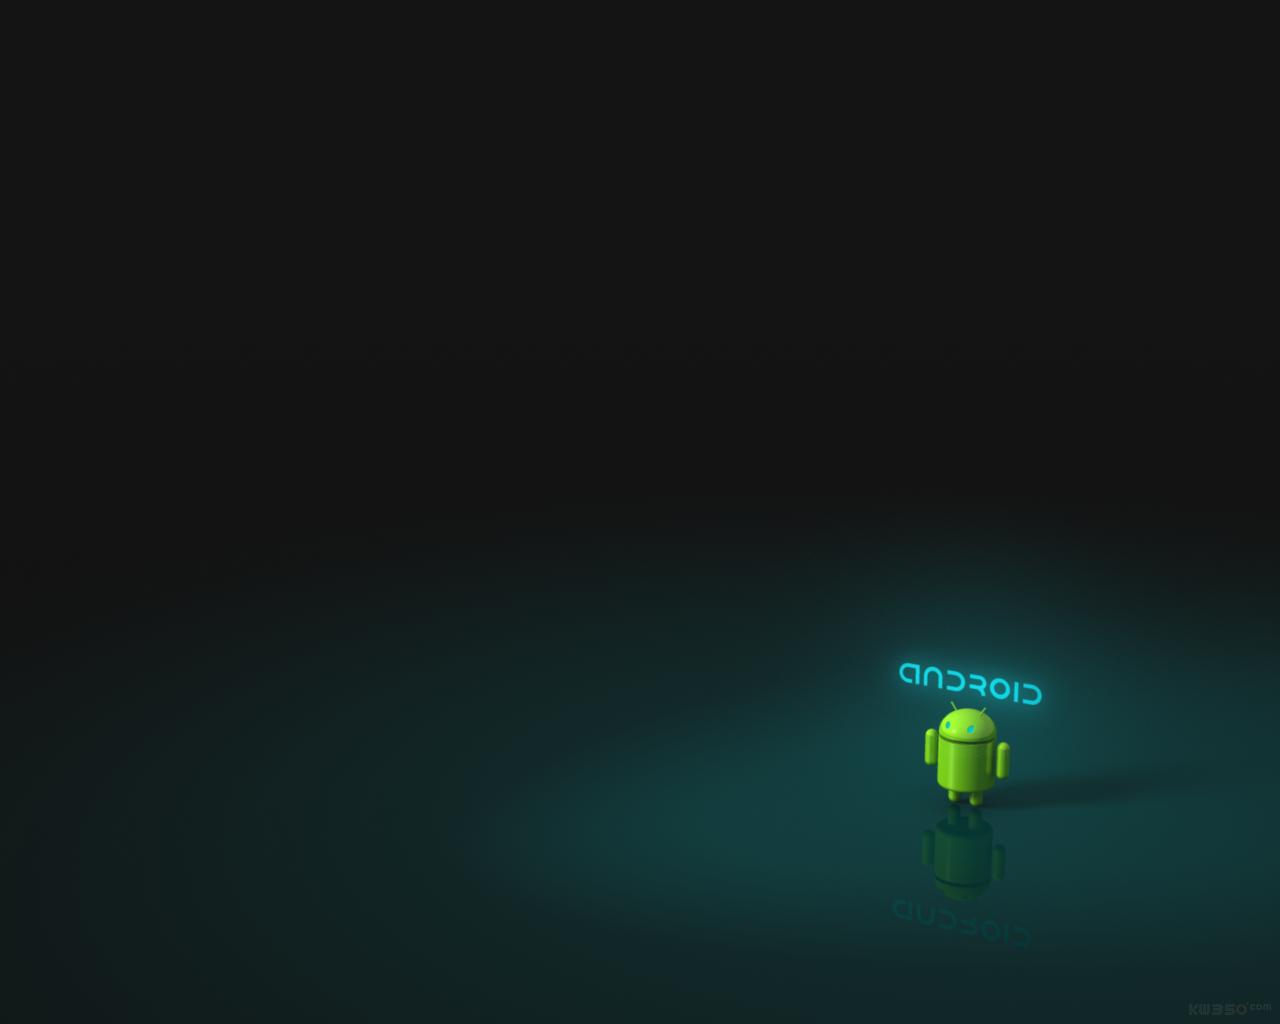 hd android wallpapers hd android wallpapers hd android wallpapers hd 1280x1024